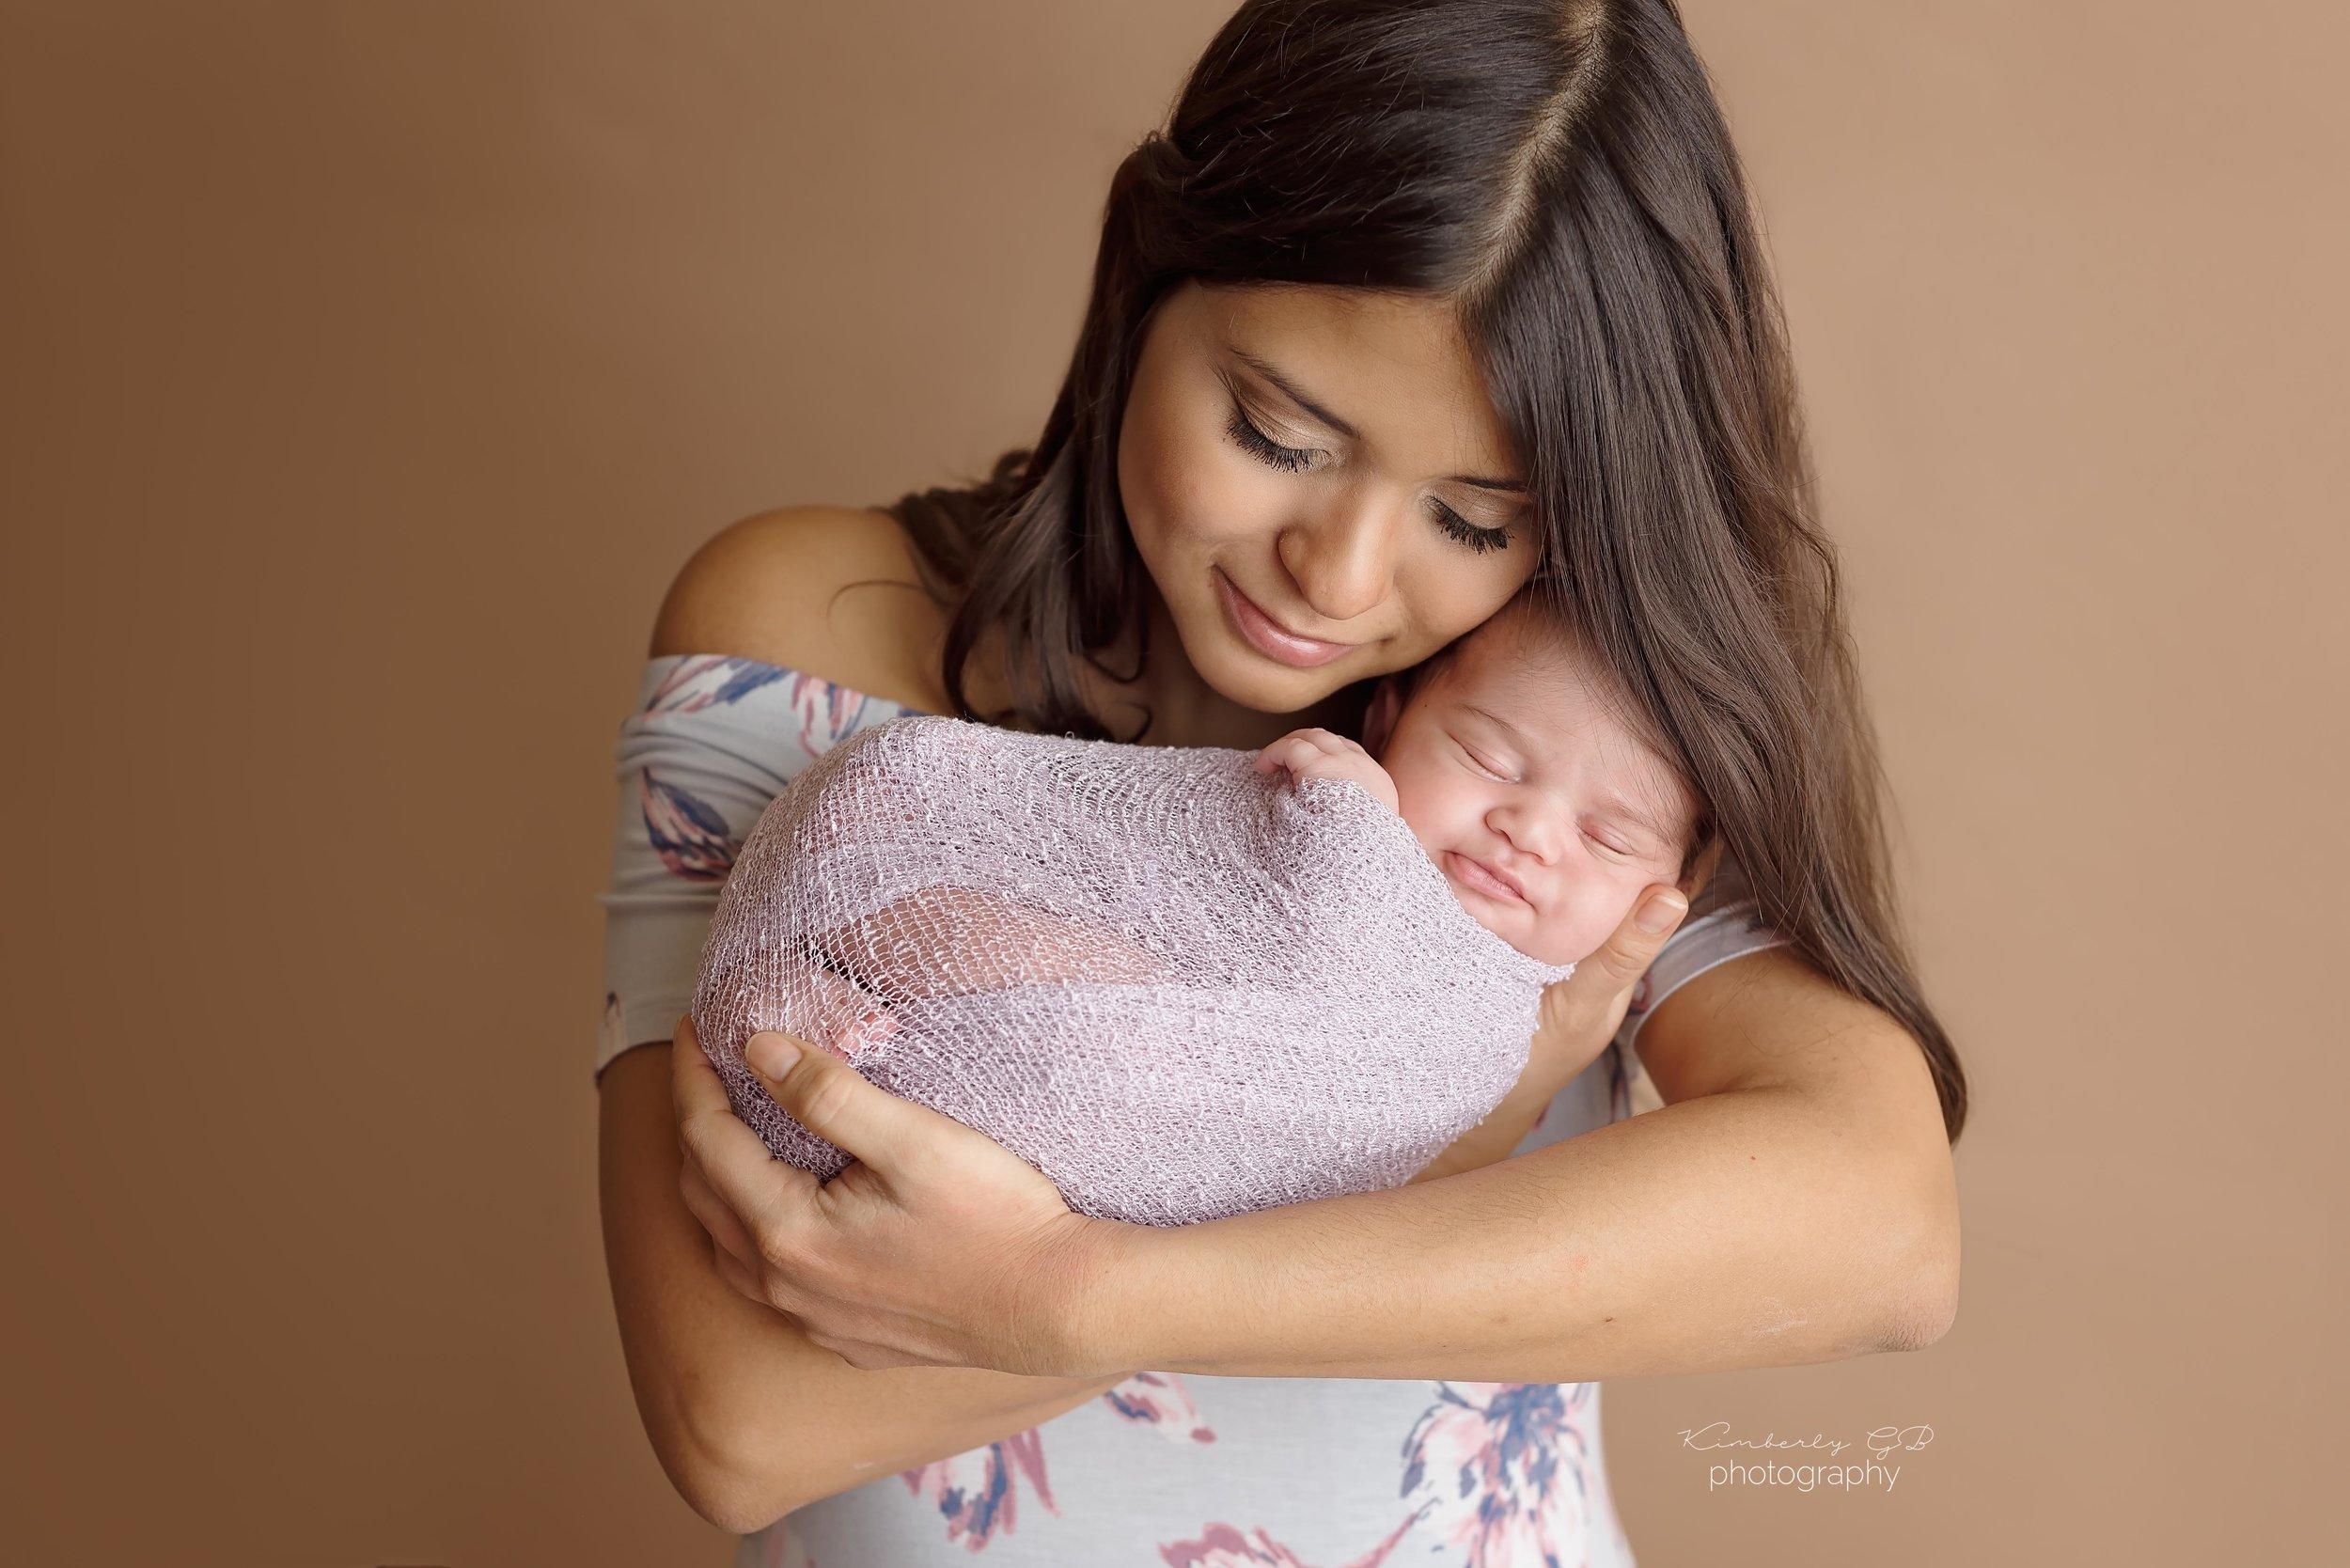 fotografia-de-recien-nacidos-bebes-newborn-en-puerto-rico-kimberly-gb-photography-fotografa-182.jpg